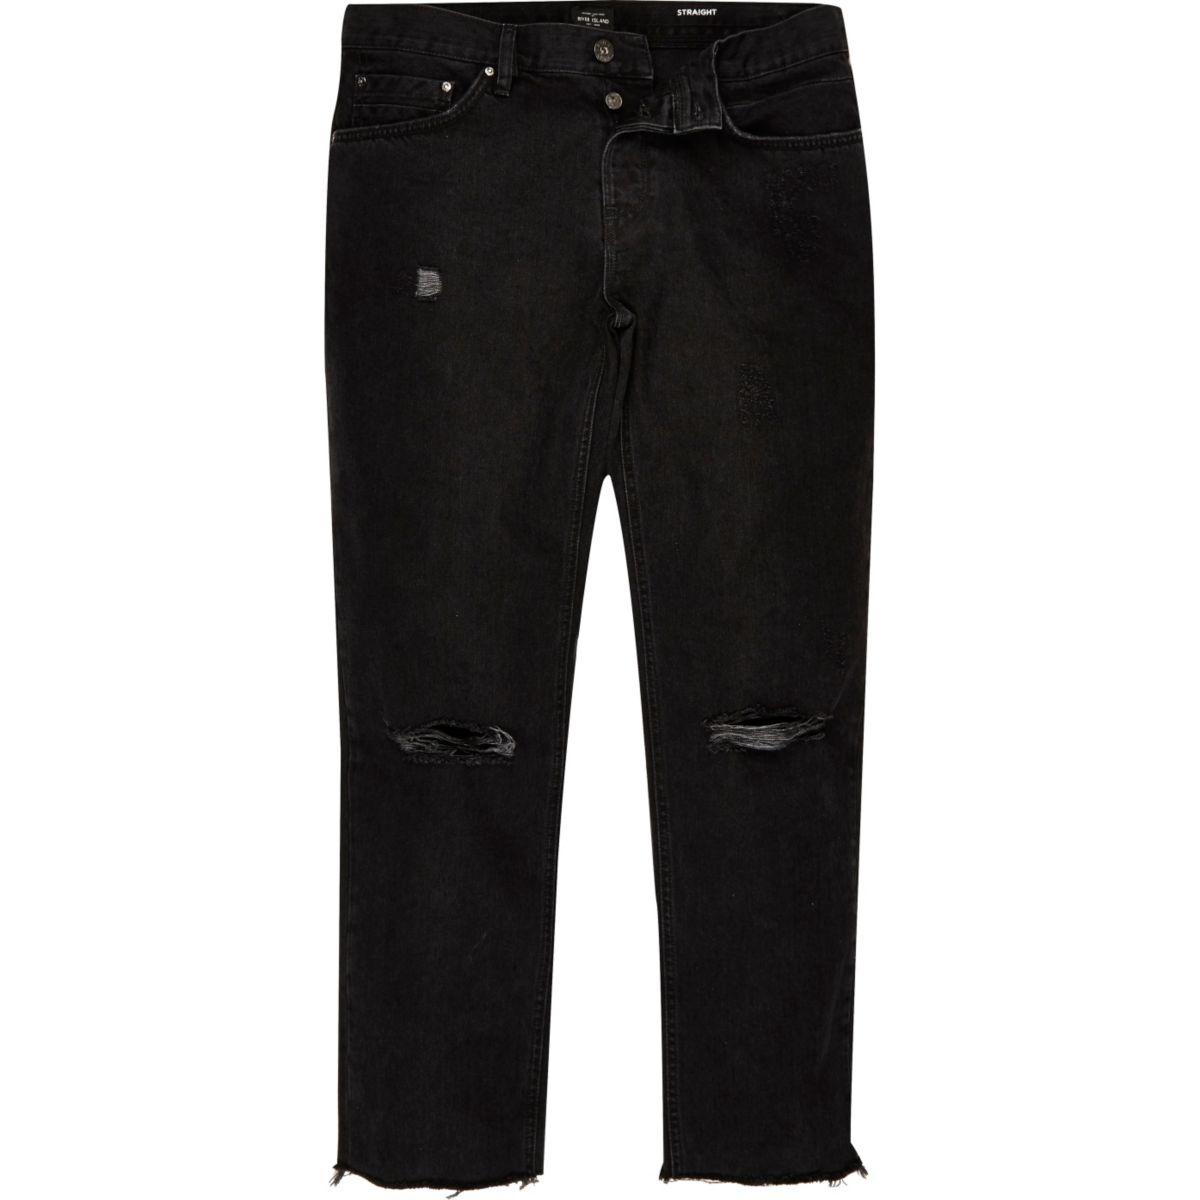 Dean zwarte ripped rechte jeans